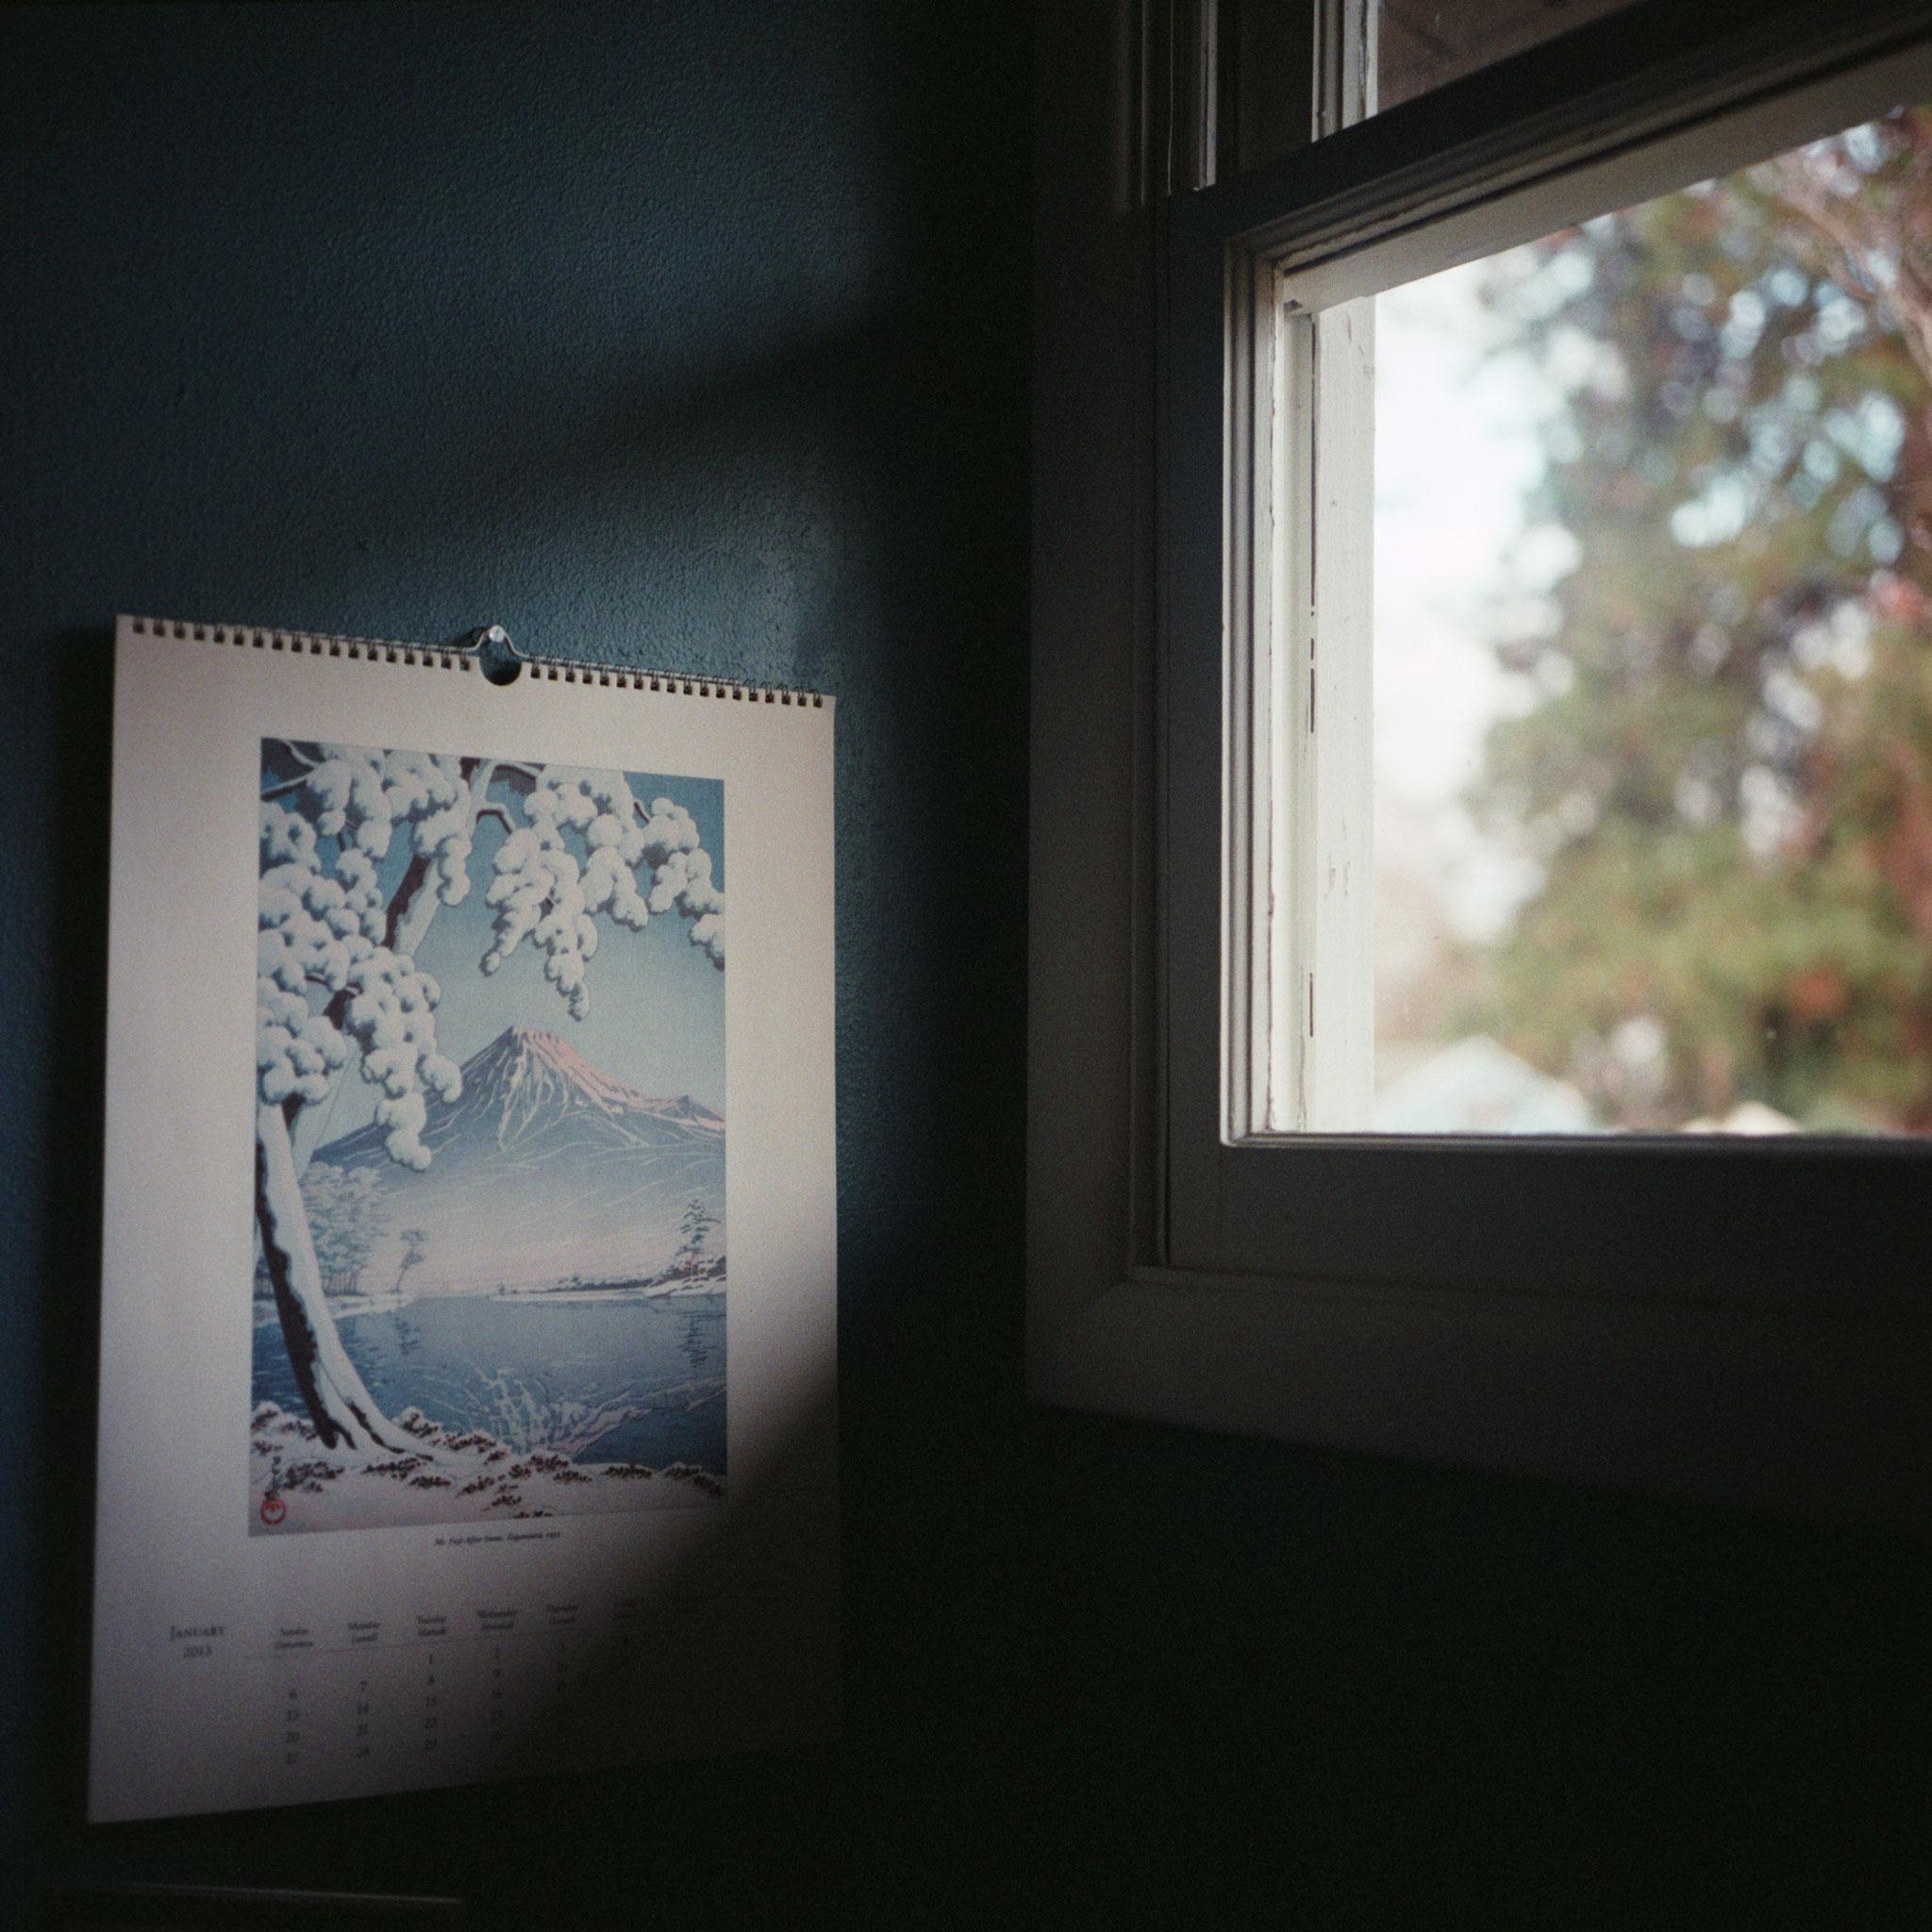 Katt Janson Merilo | January 2013 | Rolleiflex Planar 3